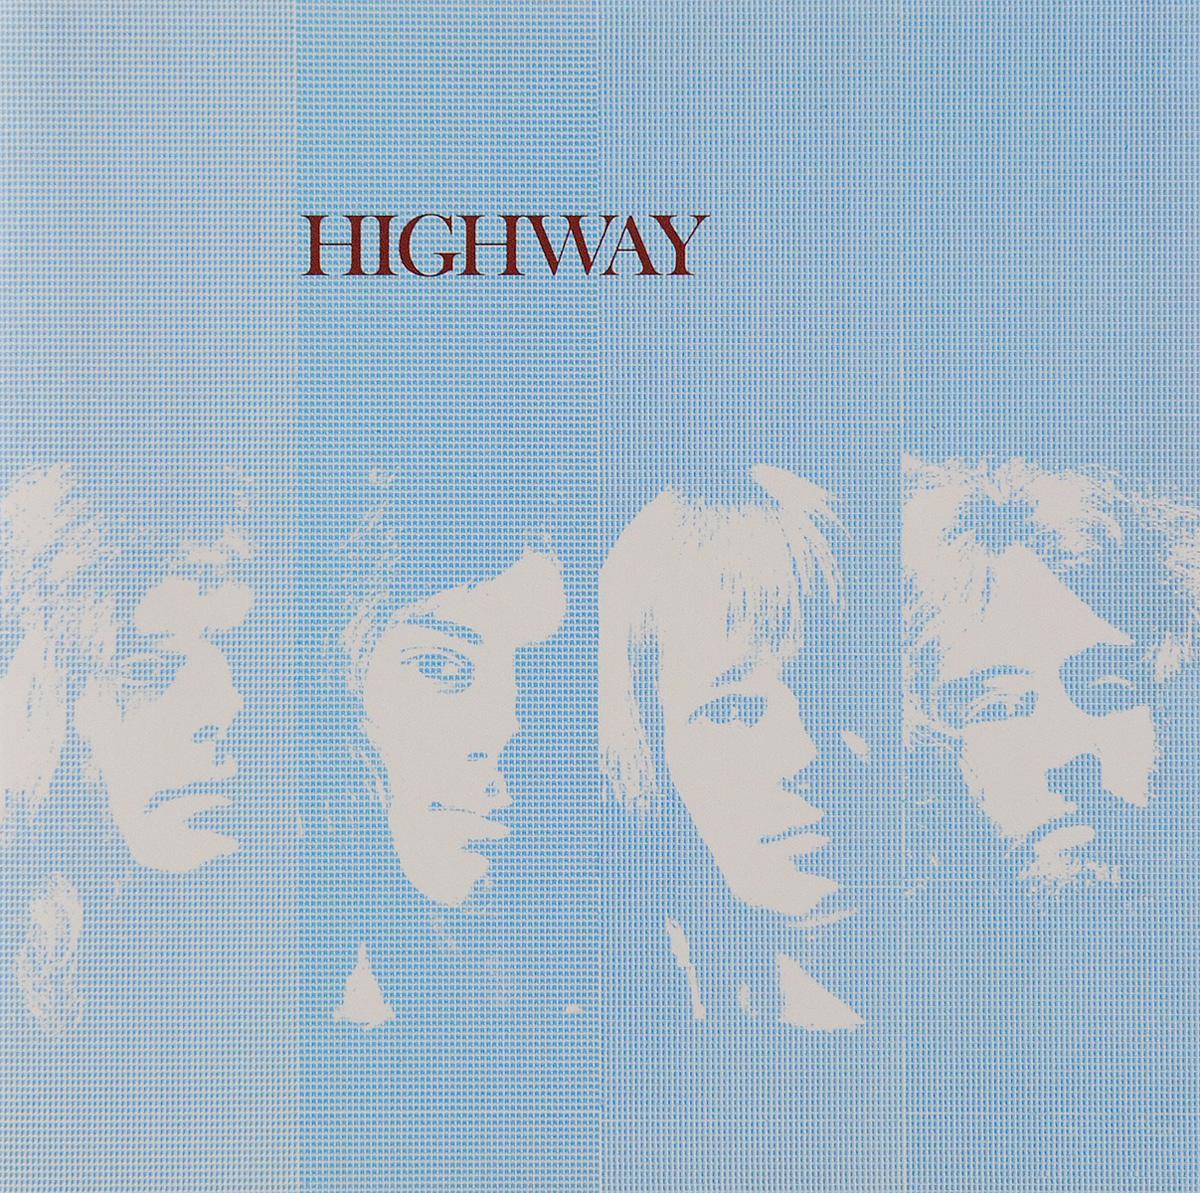 """Free"" Free. Highway"